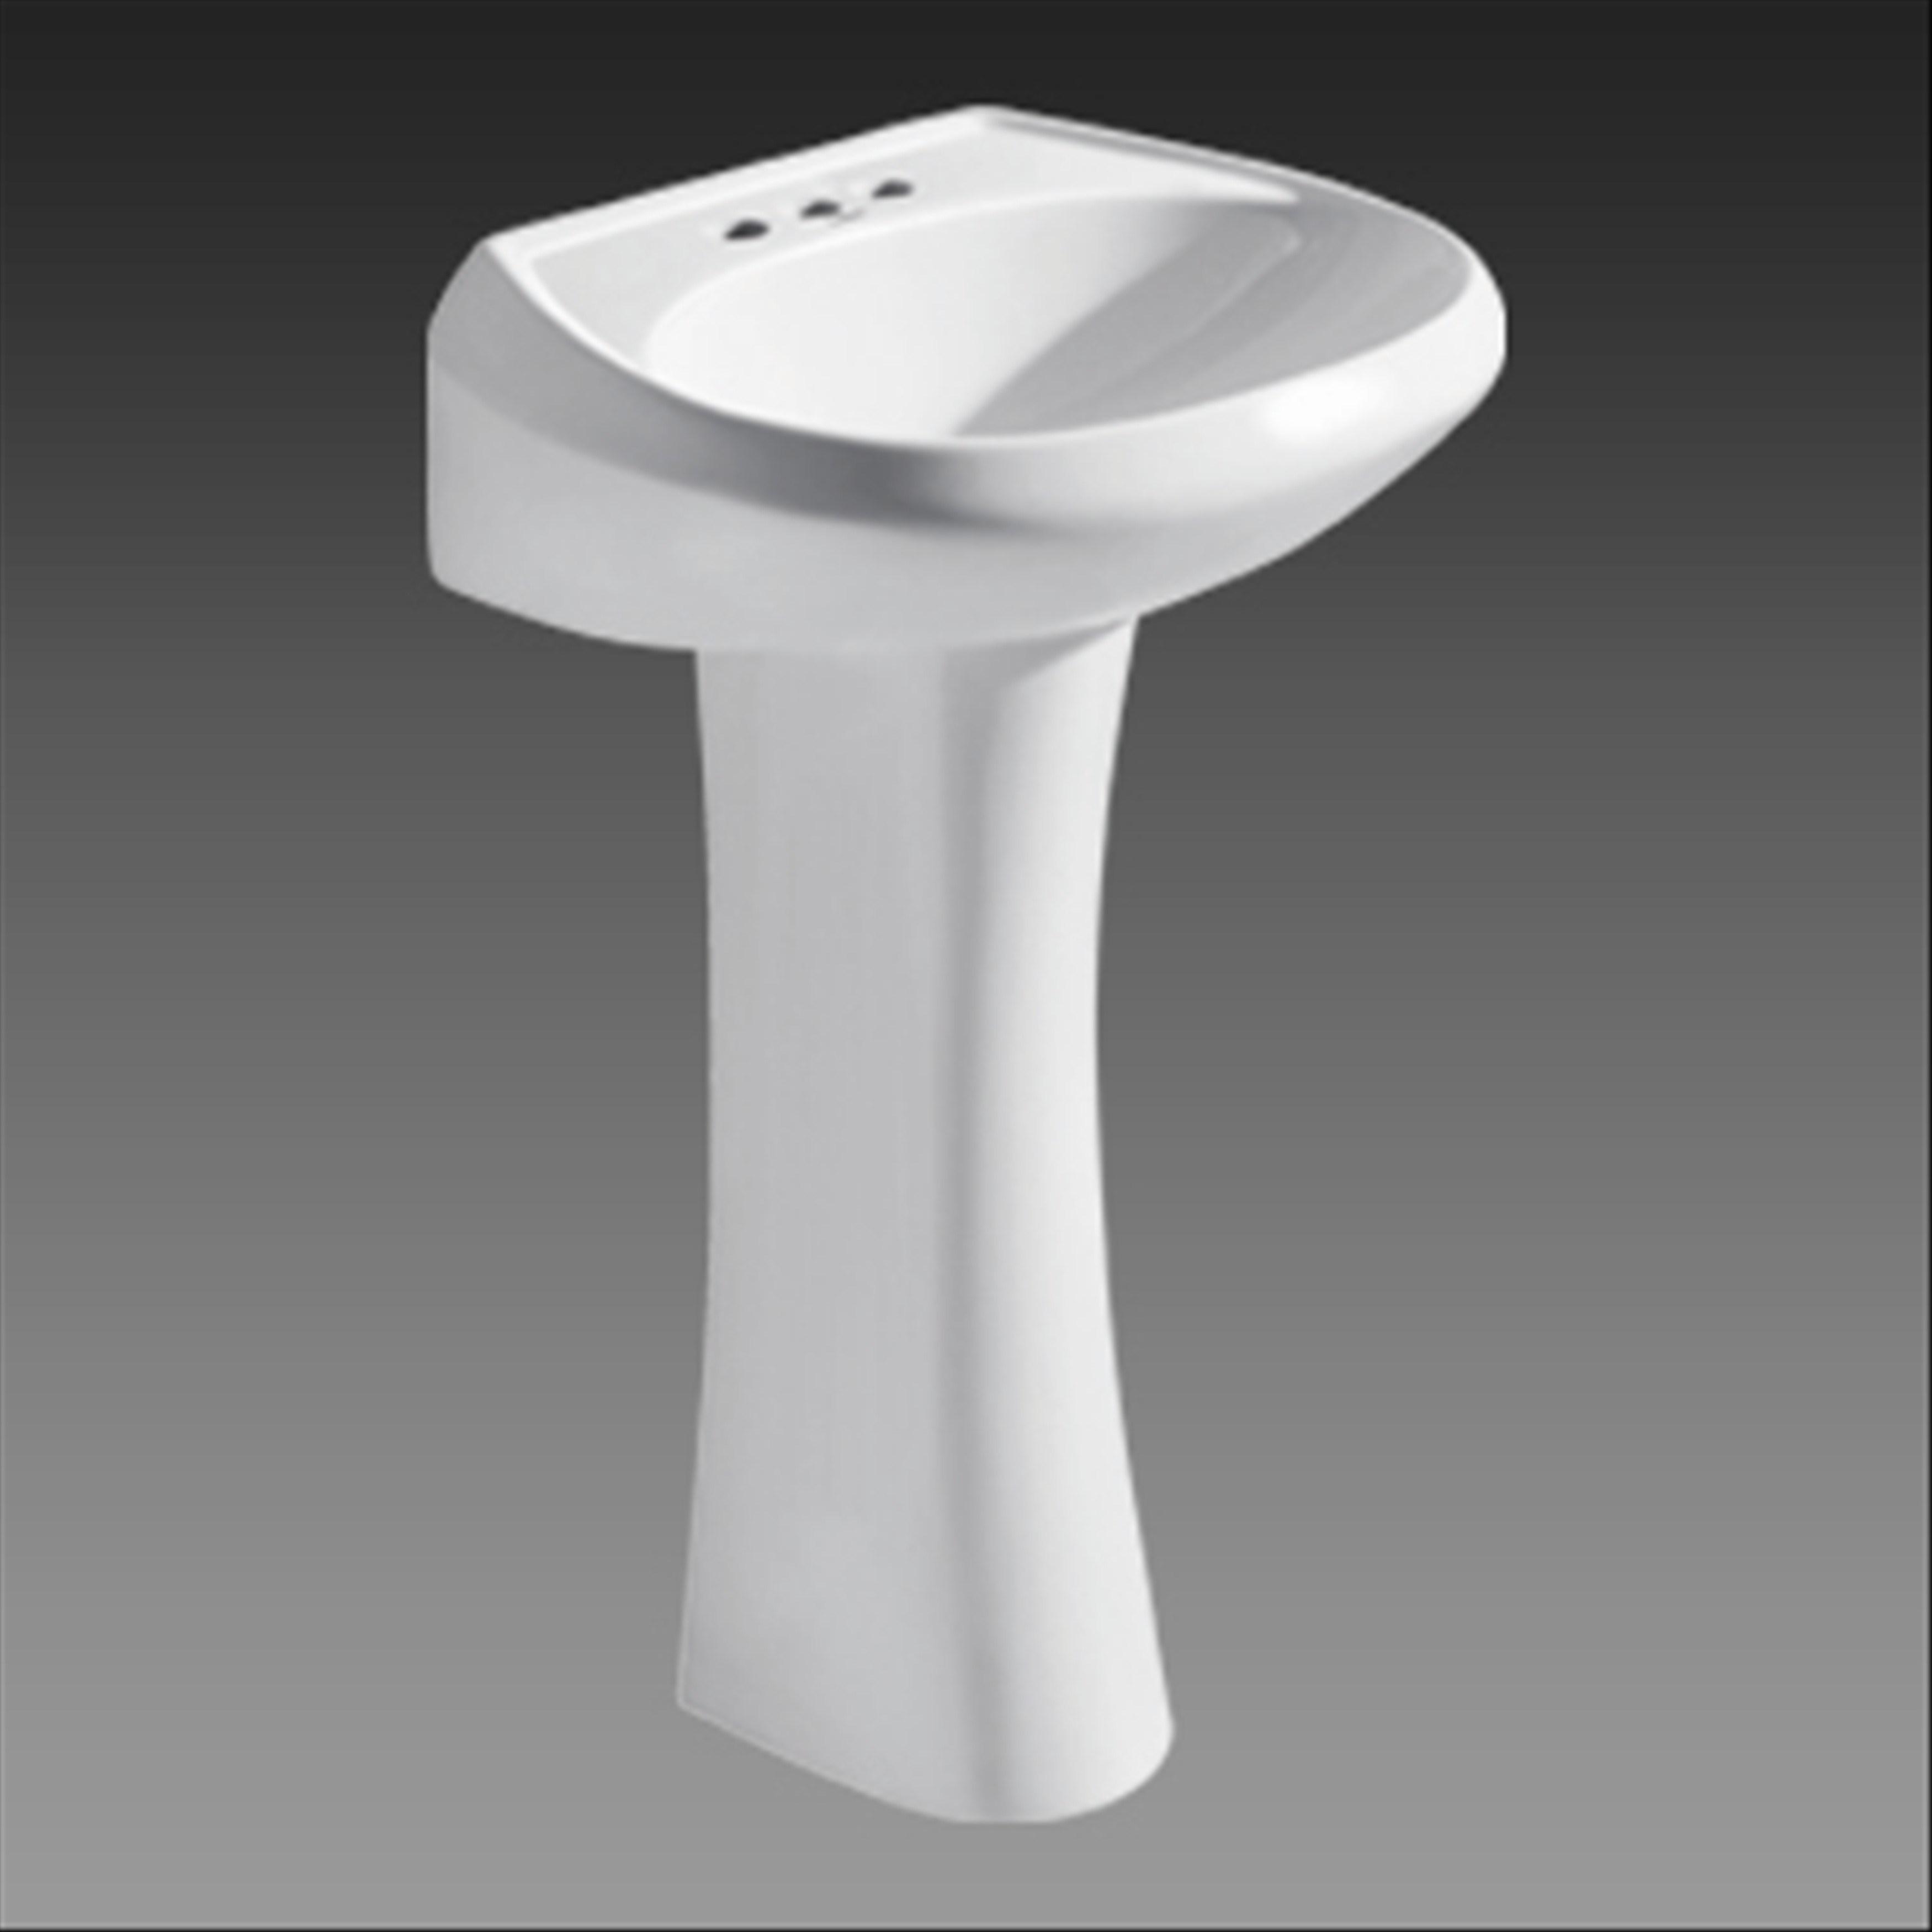 Pedestal Basin : Pedestal Basin / Ceramic Wash Basin (HTM3002) - China Basin, Pedestal ...